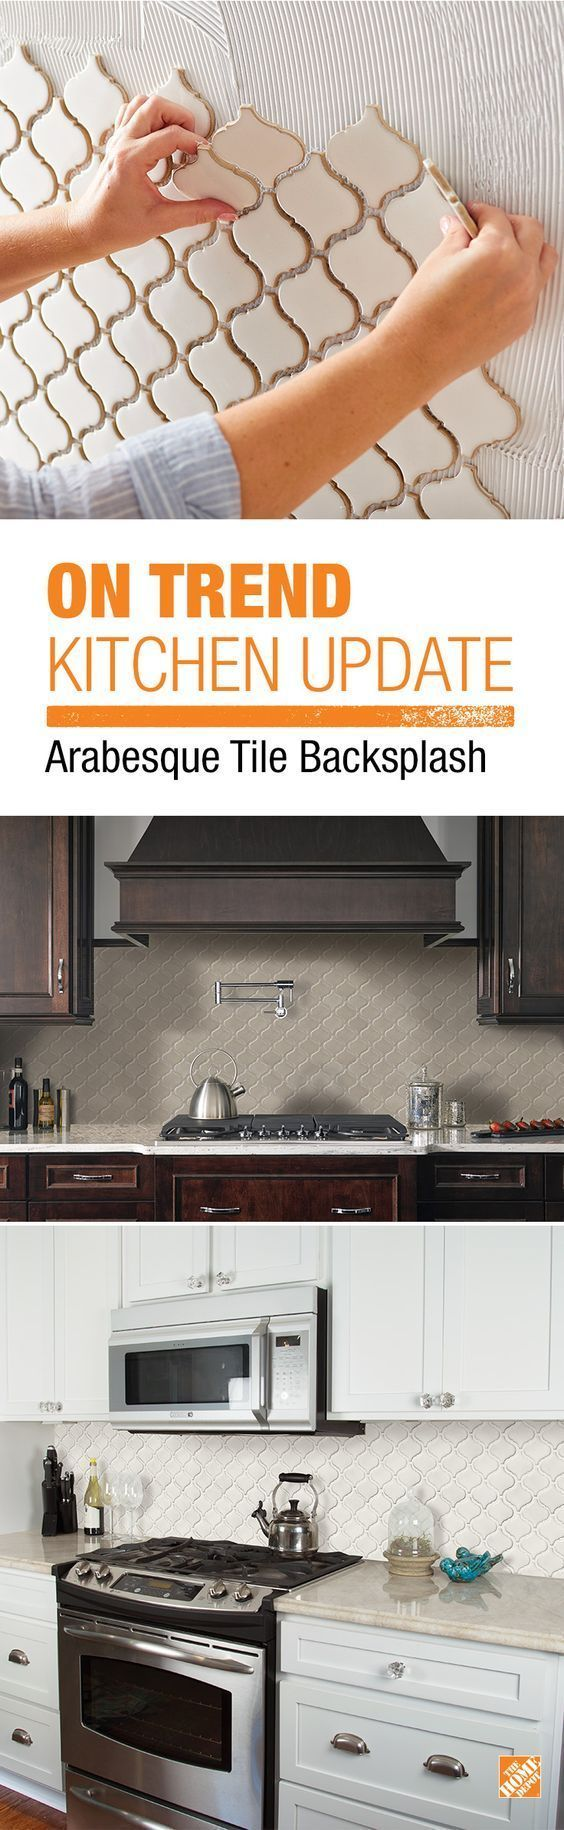 Diy Kitchen Cabinet Refacing 25 Best Ideas About Refacing Kitchen Cabinets On Pinterest